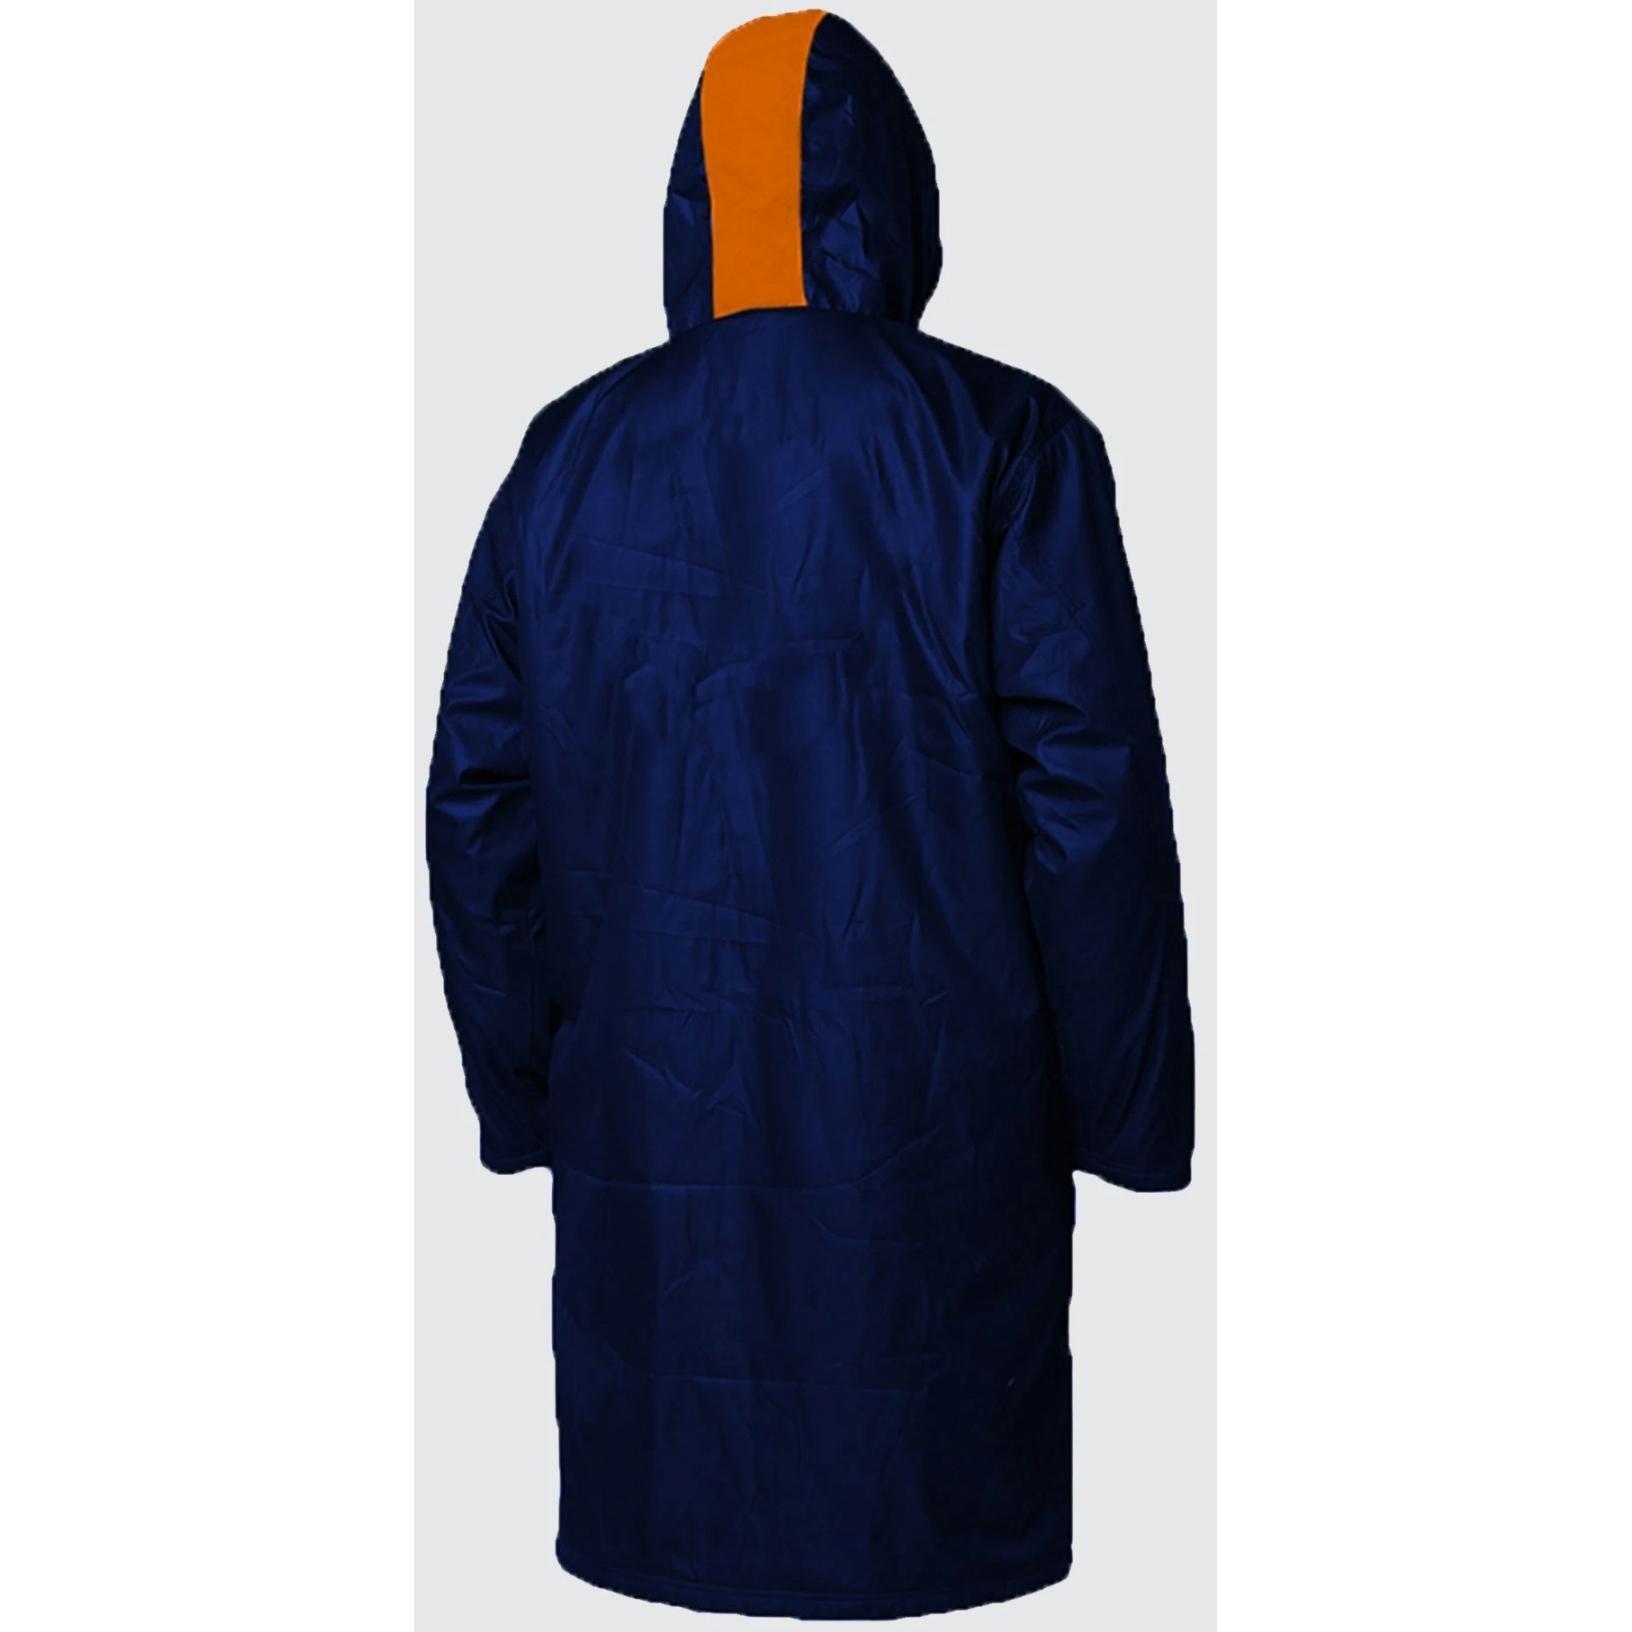 Image of Zone3 Polar Fleece Parka Robe Jacket - Navy/Grey/Orange